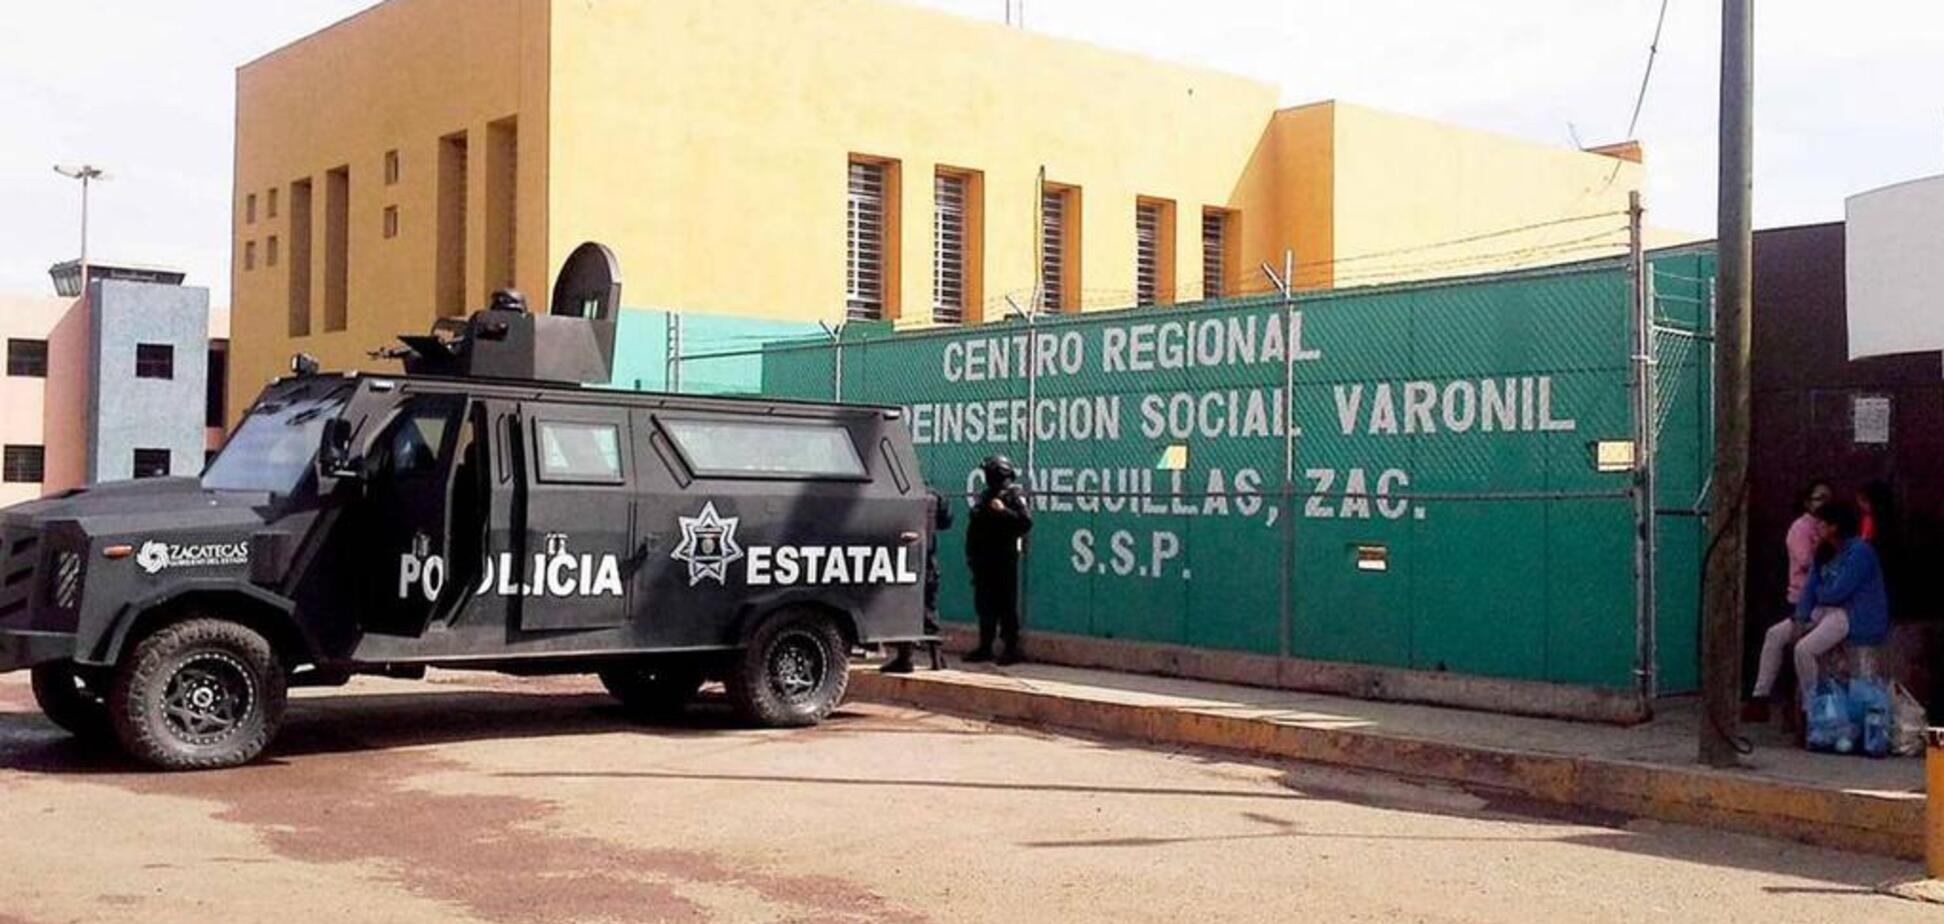 Побоїще в мексиканській в'язниці